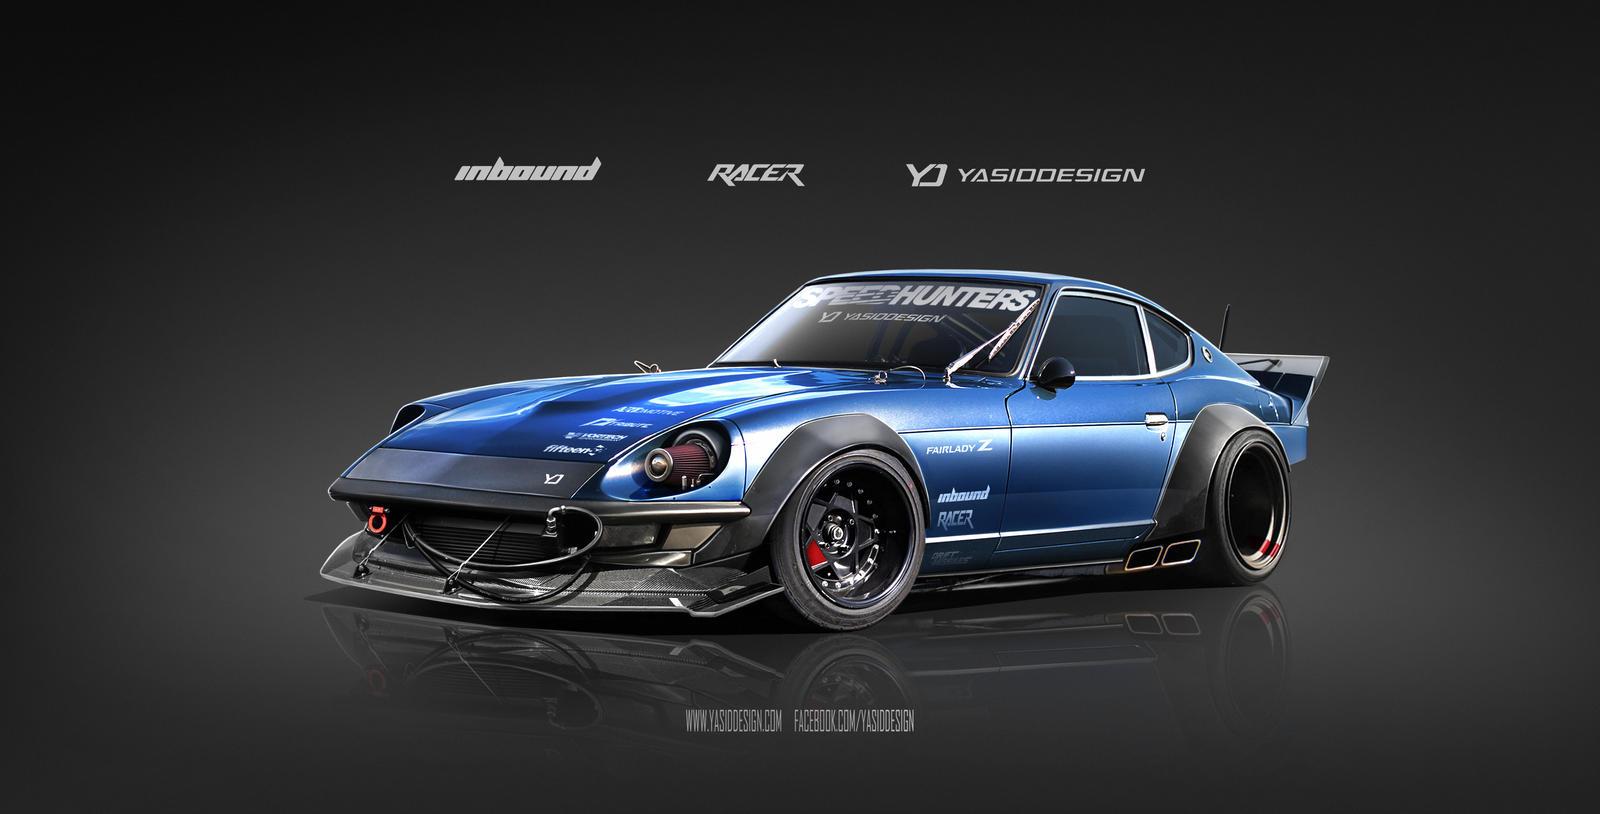 Inbound Racer 240z Datsun Nissan By Yasiddesign On Deviantart